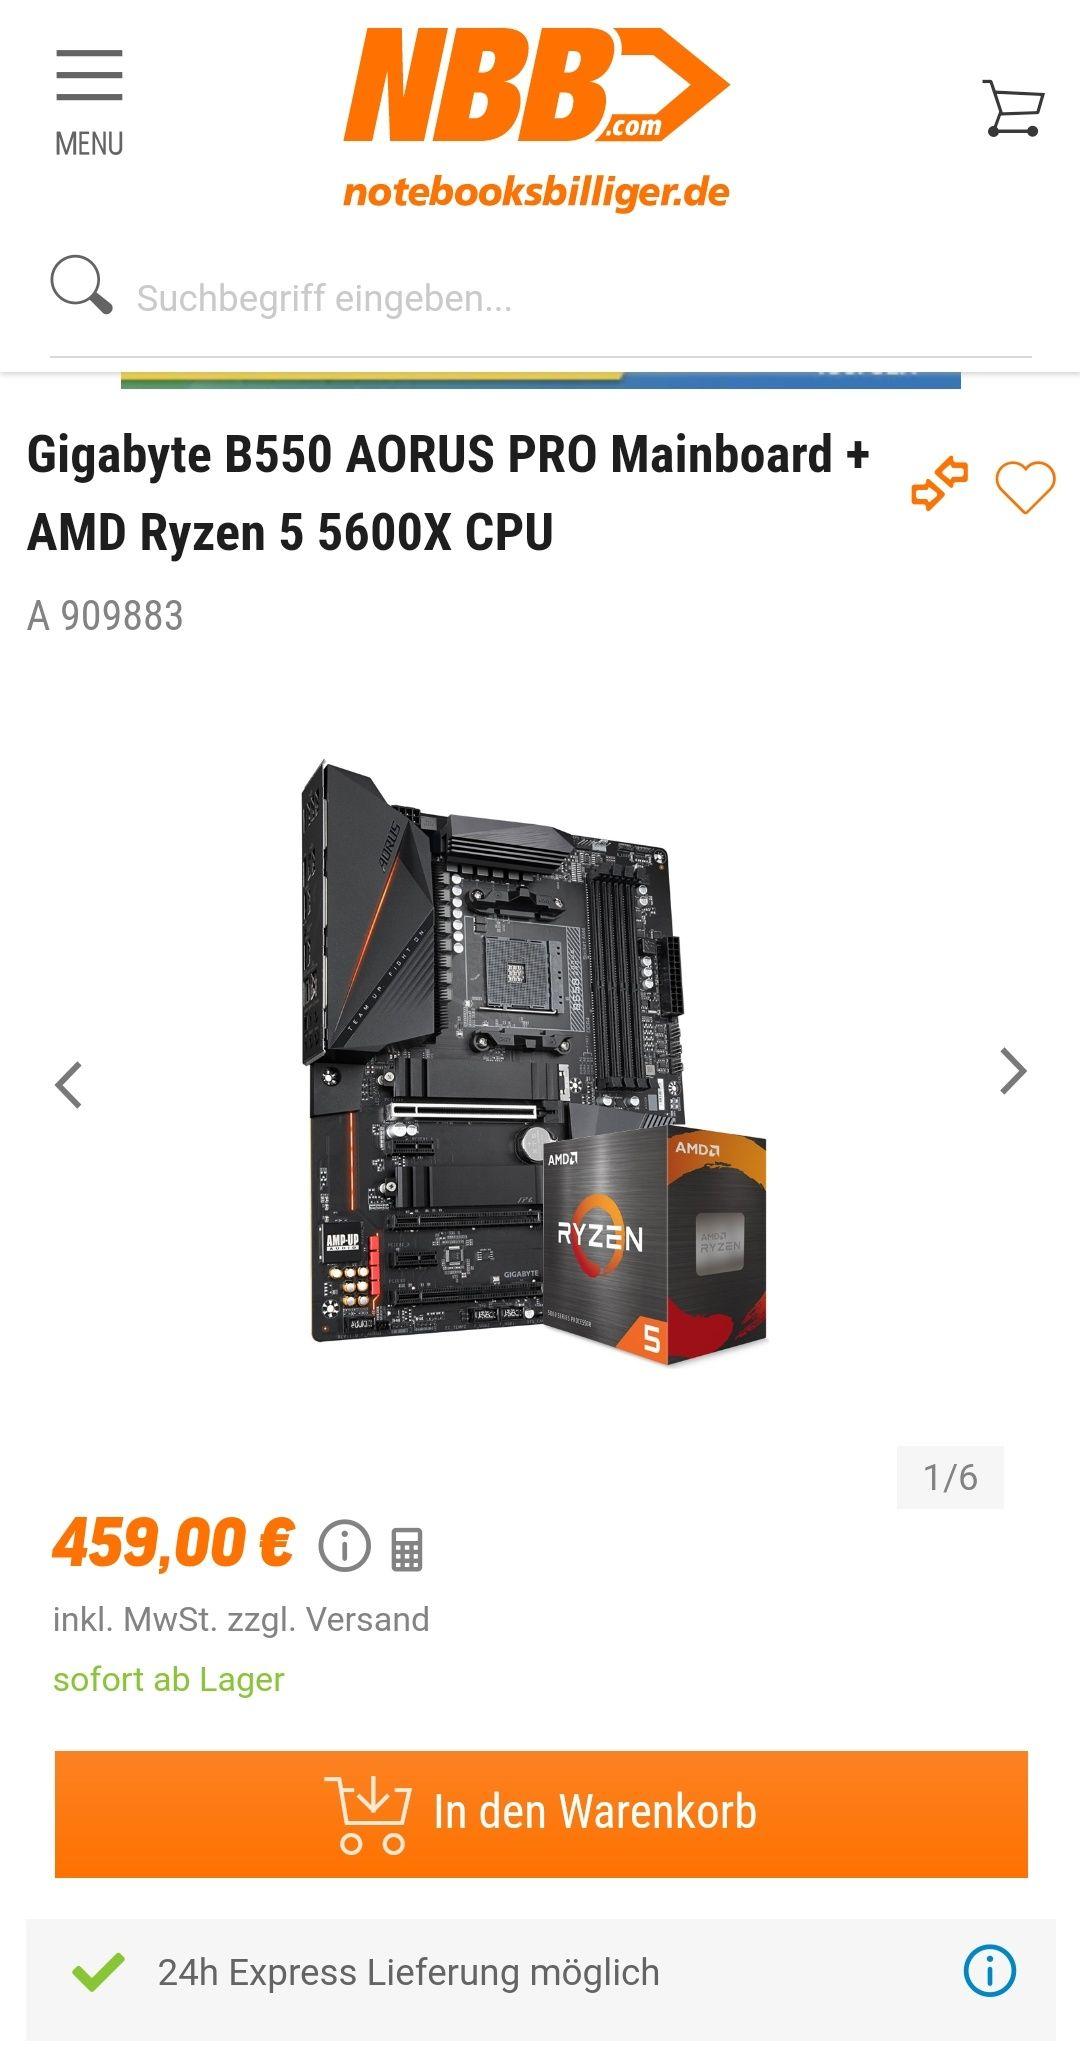 Gigabyte B550 AORUS PRO Mainboard + AMD Ryzen 5 5600X CPU